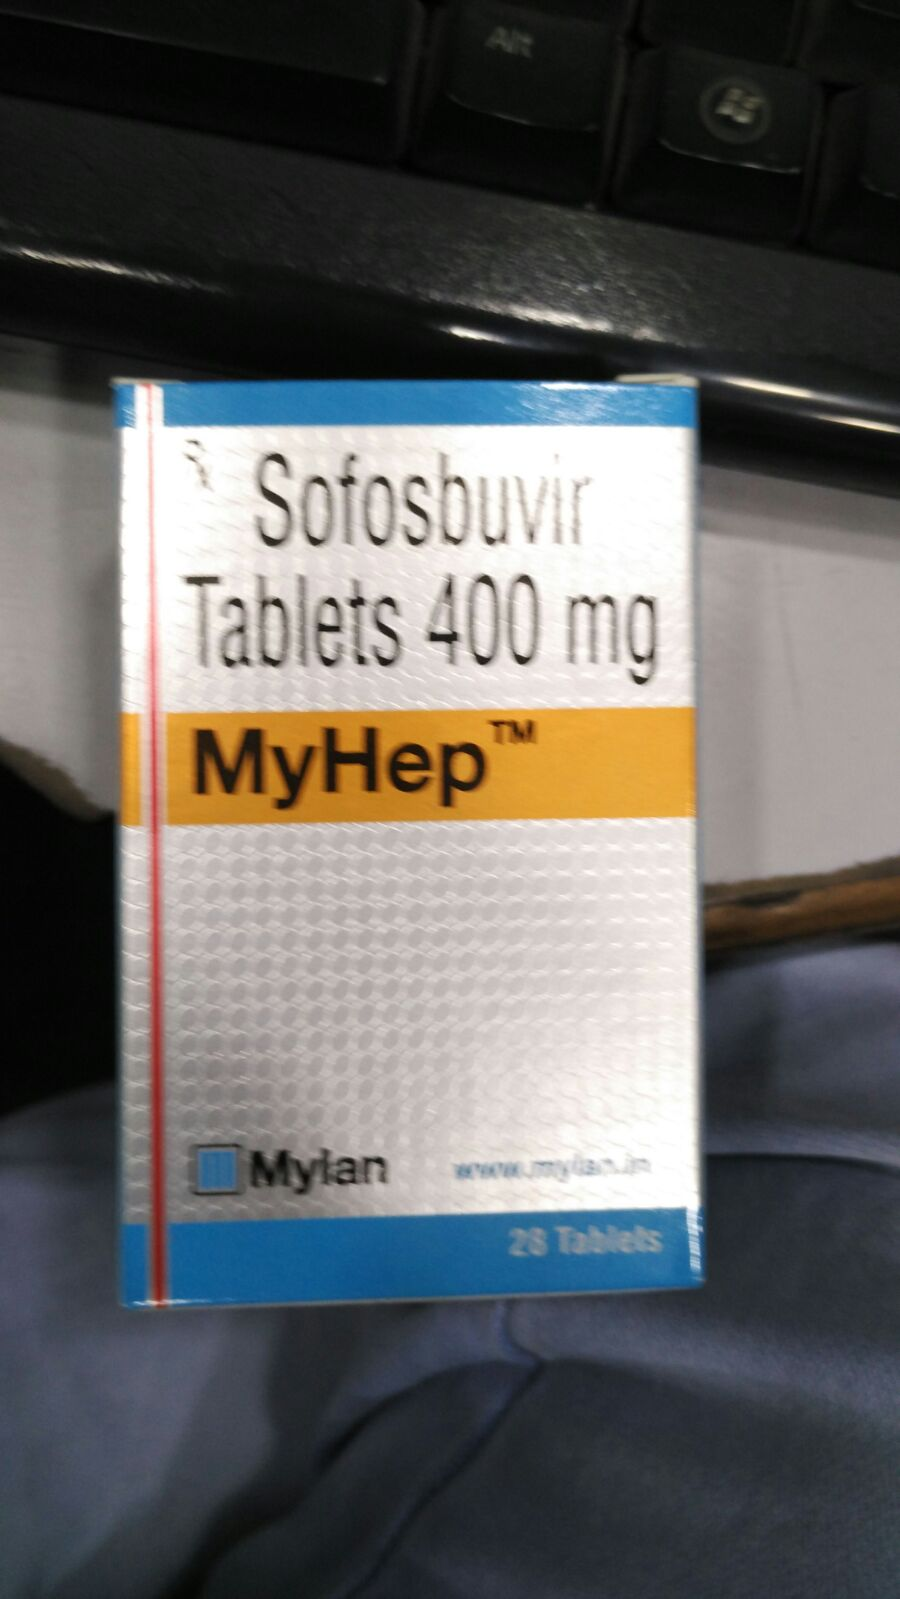 Sofosbuvir, Sovaldi, Hepcinat